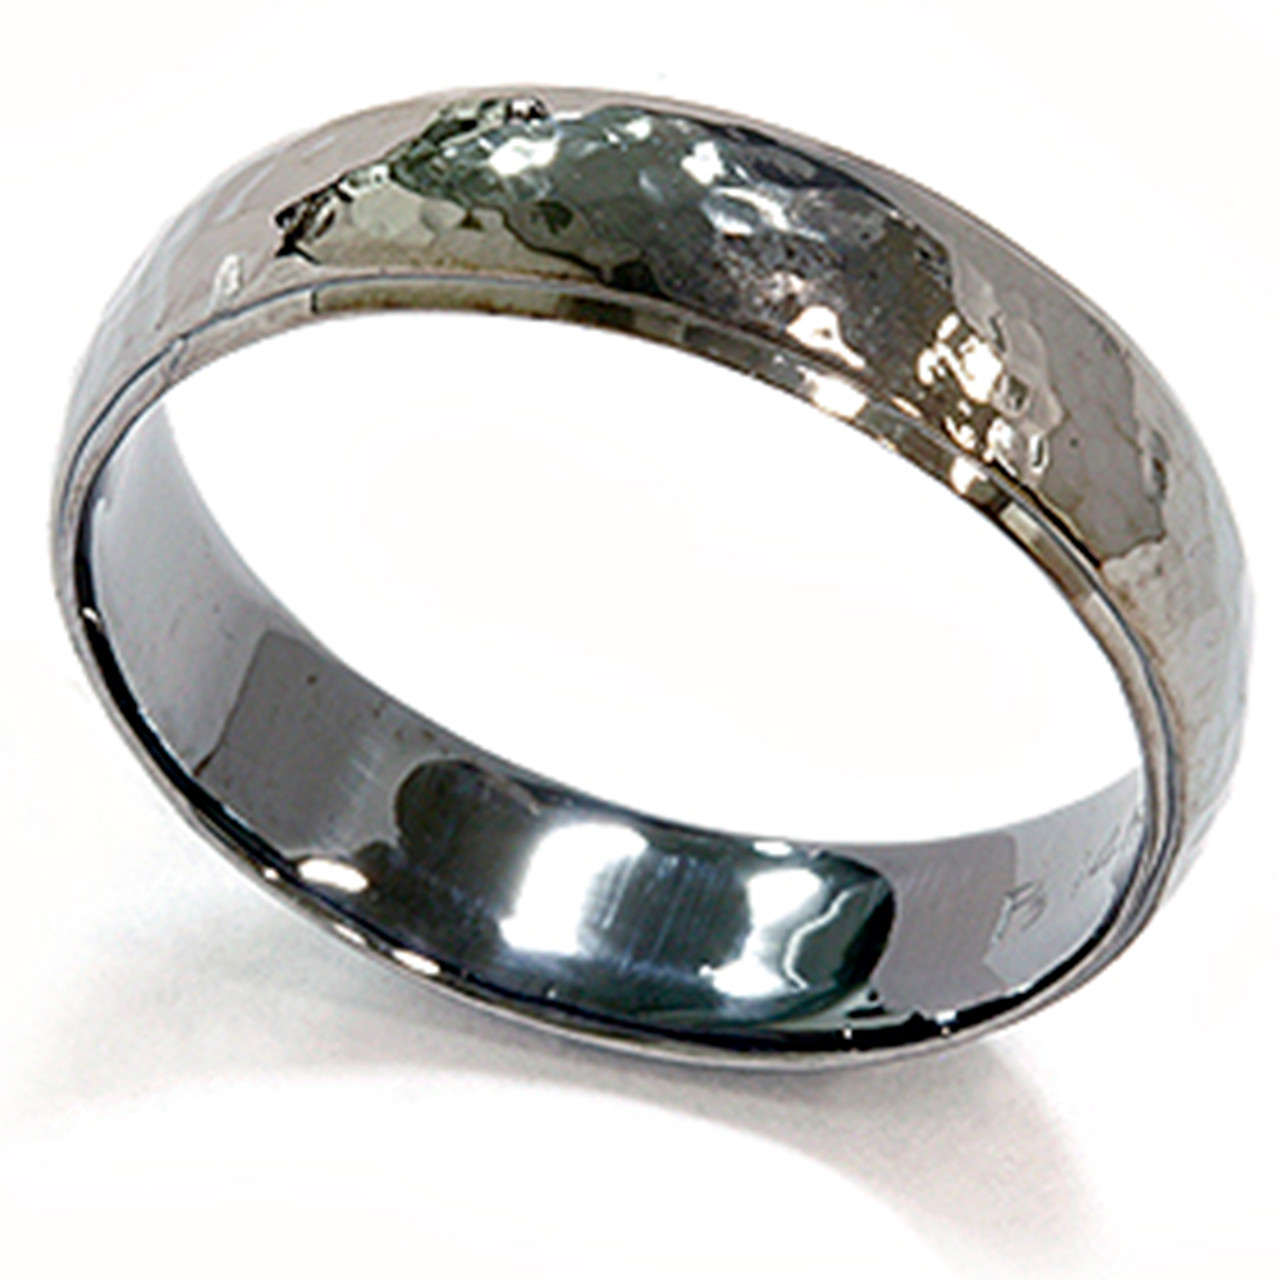 Men S Wedding Ring.Mens 14k Black Gold Hammered Wedding Ring 6mm New Band